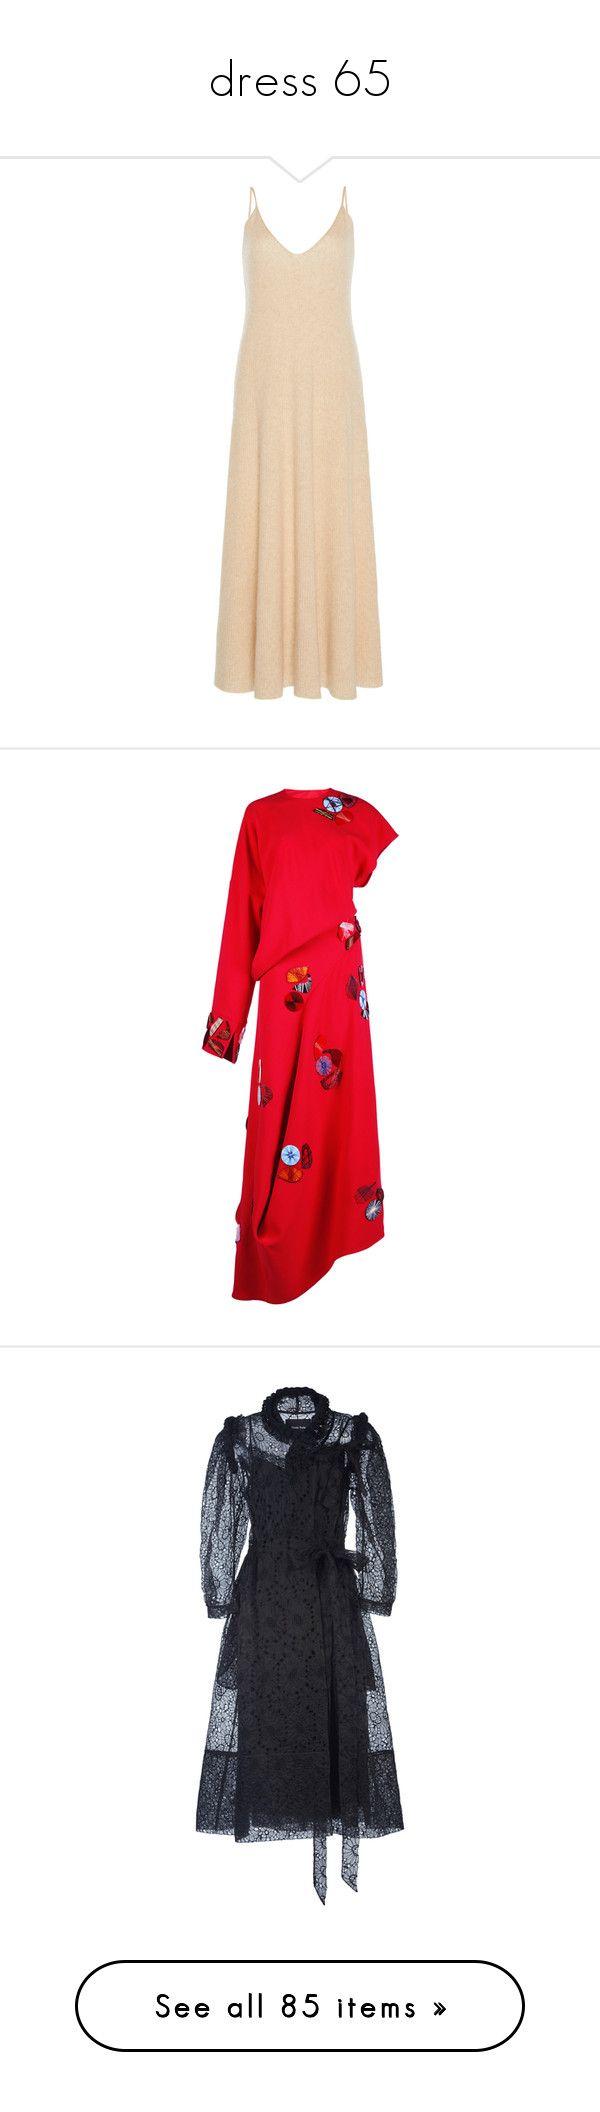 """dress 65"" by missmimimj ❤ liked on Polyvore featuring dresses, neutral, v neck dress, cashmere dress, tanktop dress, v neck tank dress, tank top dress, red asymmetrical dress, roksanda dress and embroidered dress"